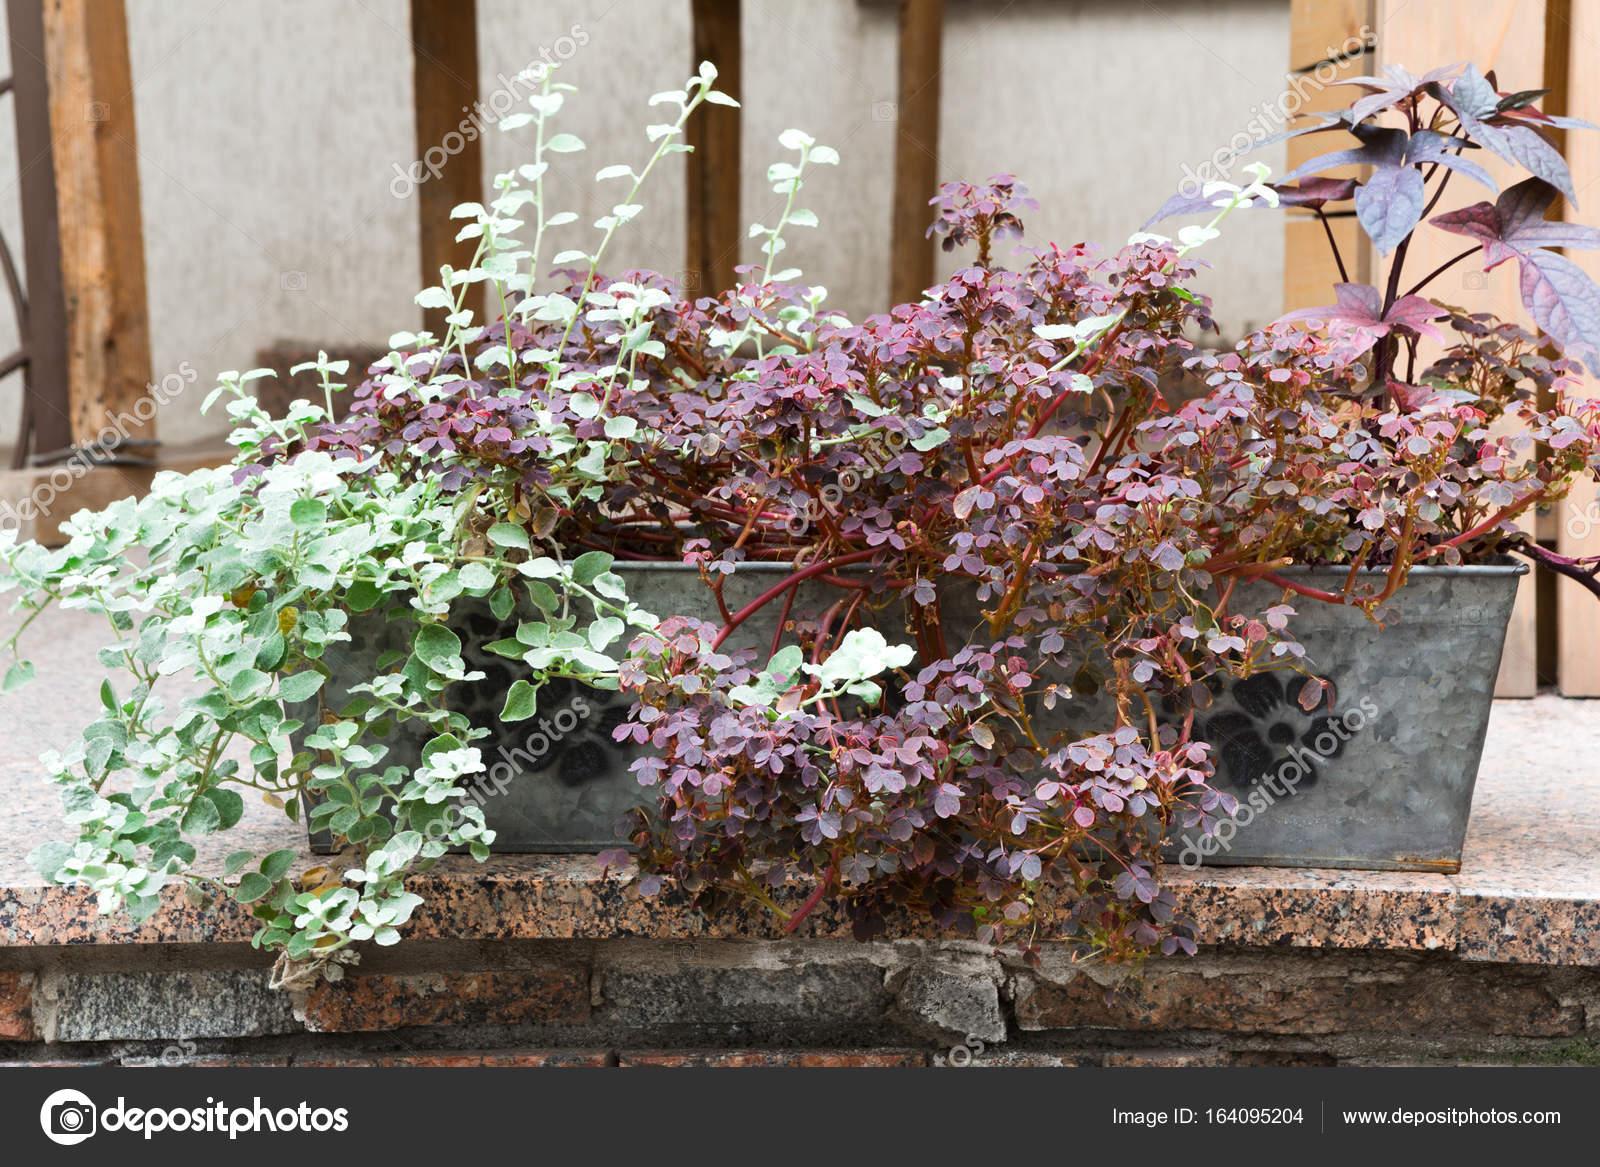 pflanzen im blumentopf — stockfoto © milkos #164095204